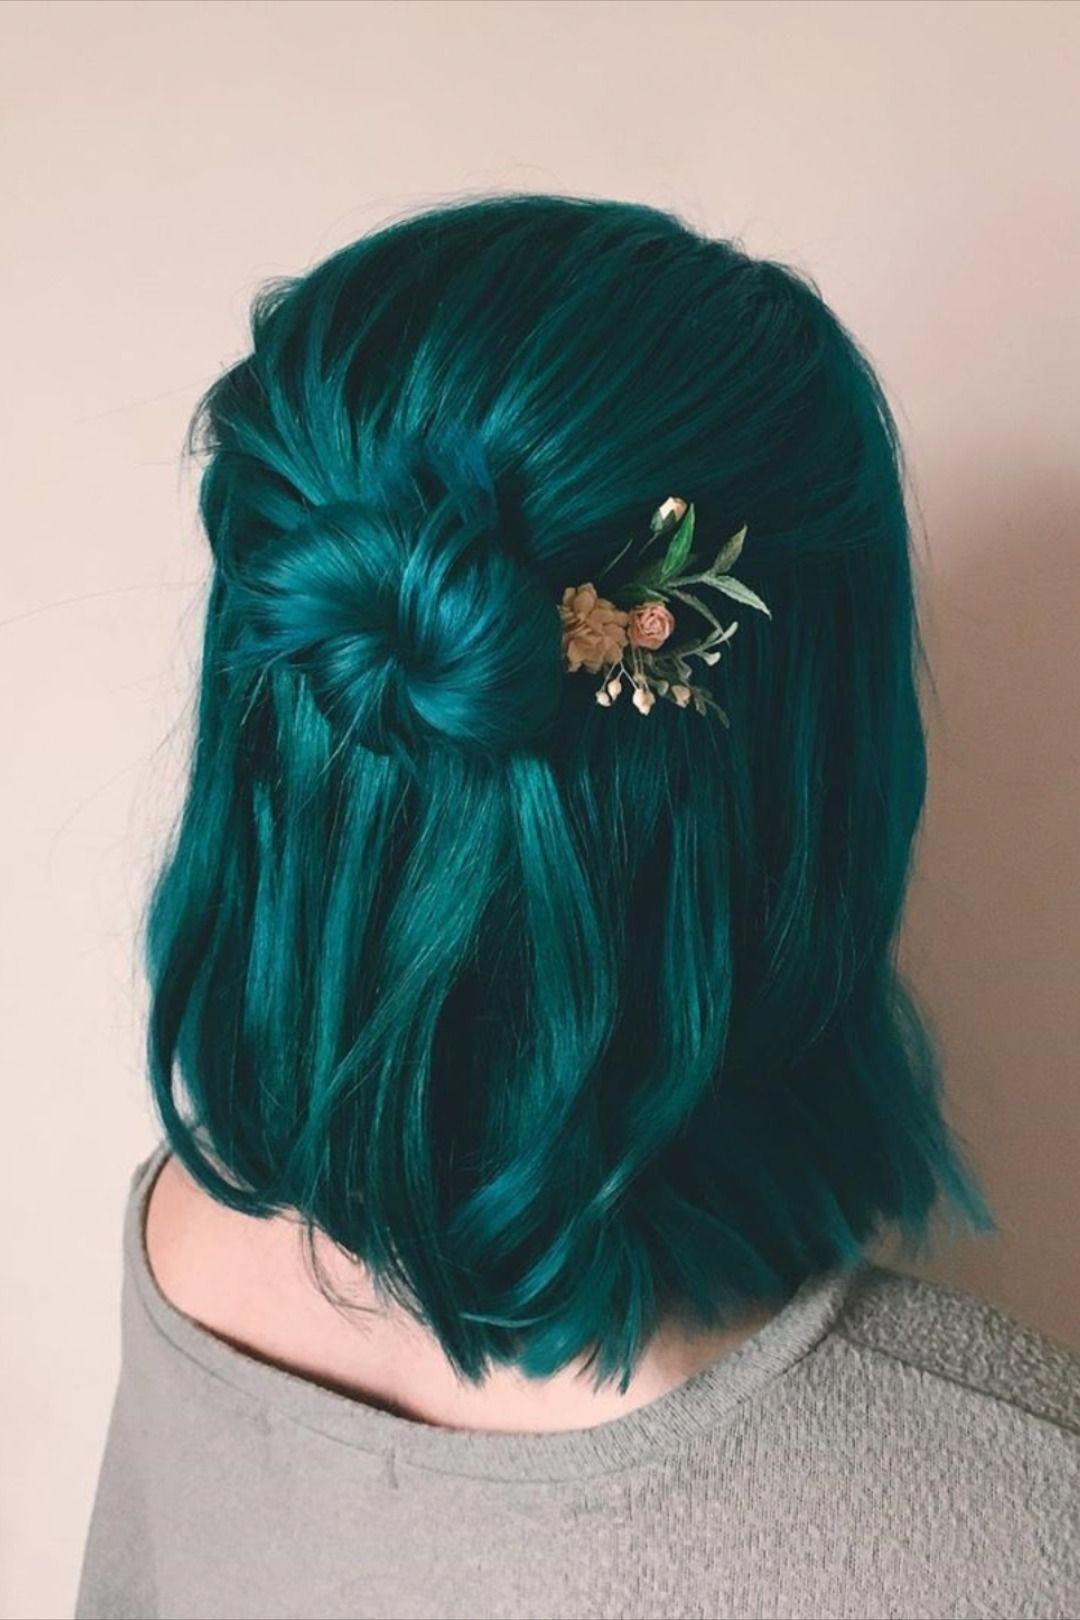 Aquamarine In 2020 Cool Hair Color Arctic Fox Hair Color Hair Styles